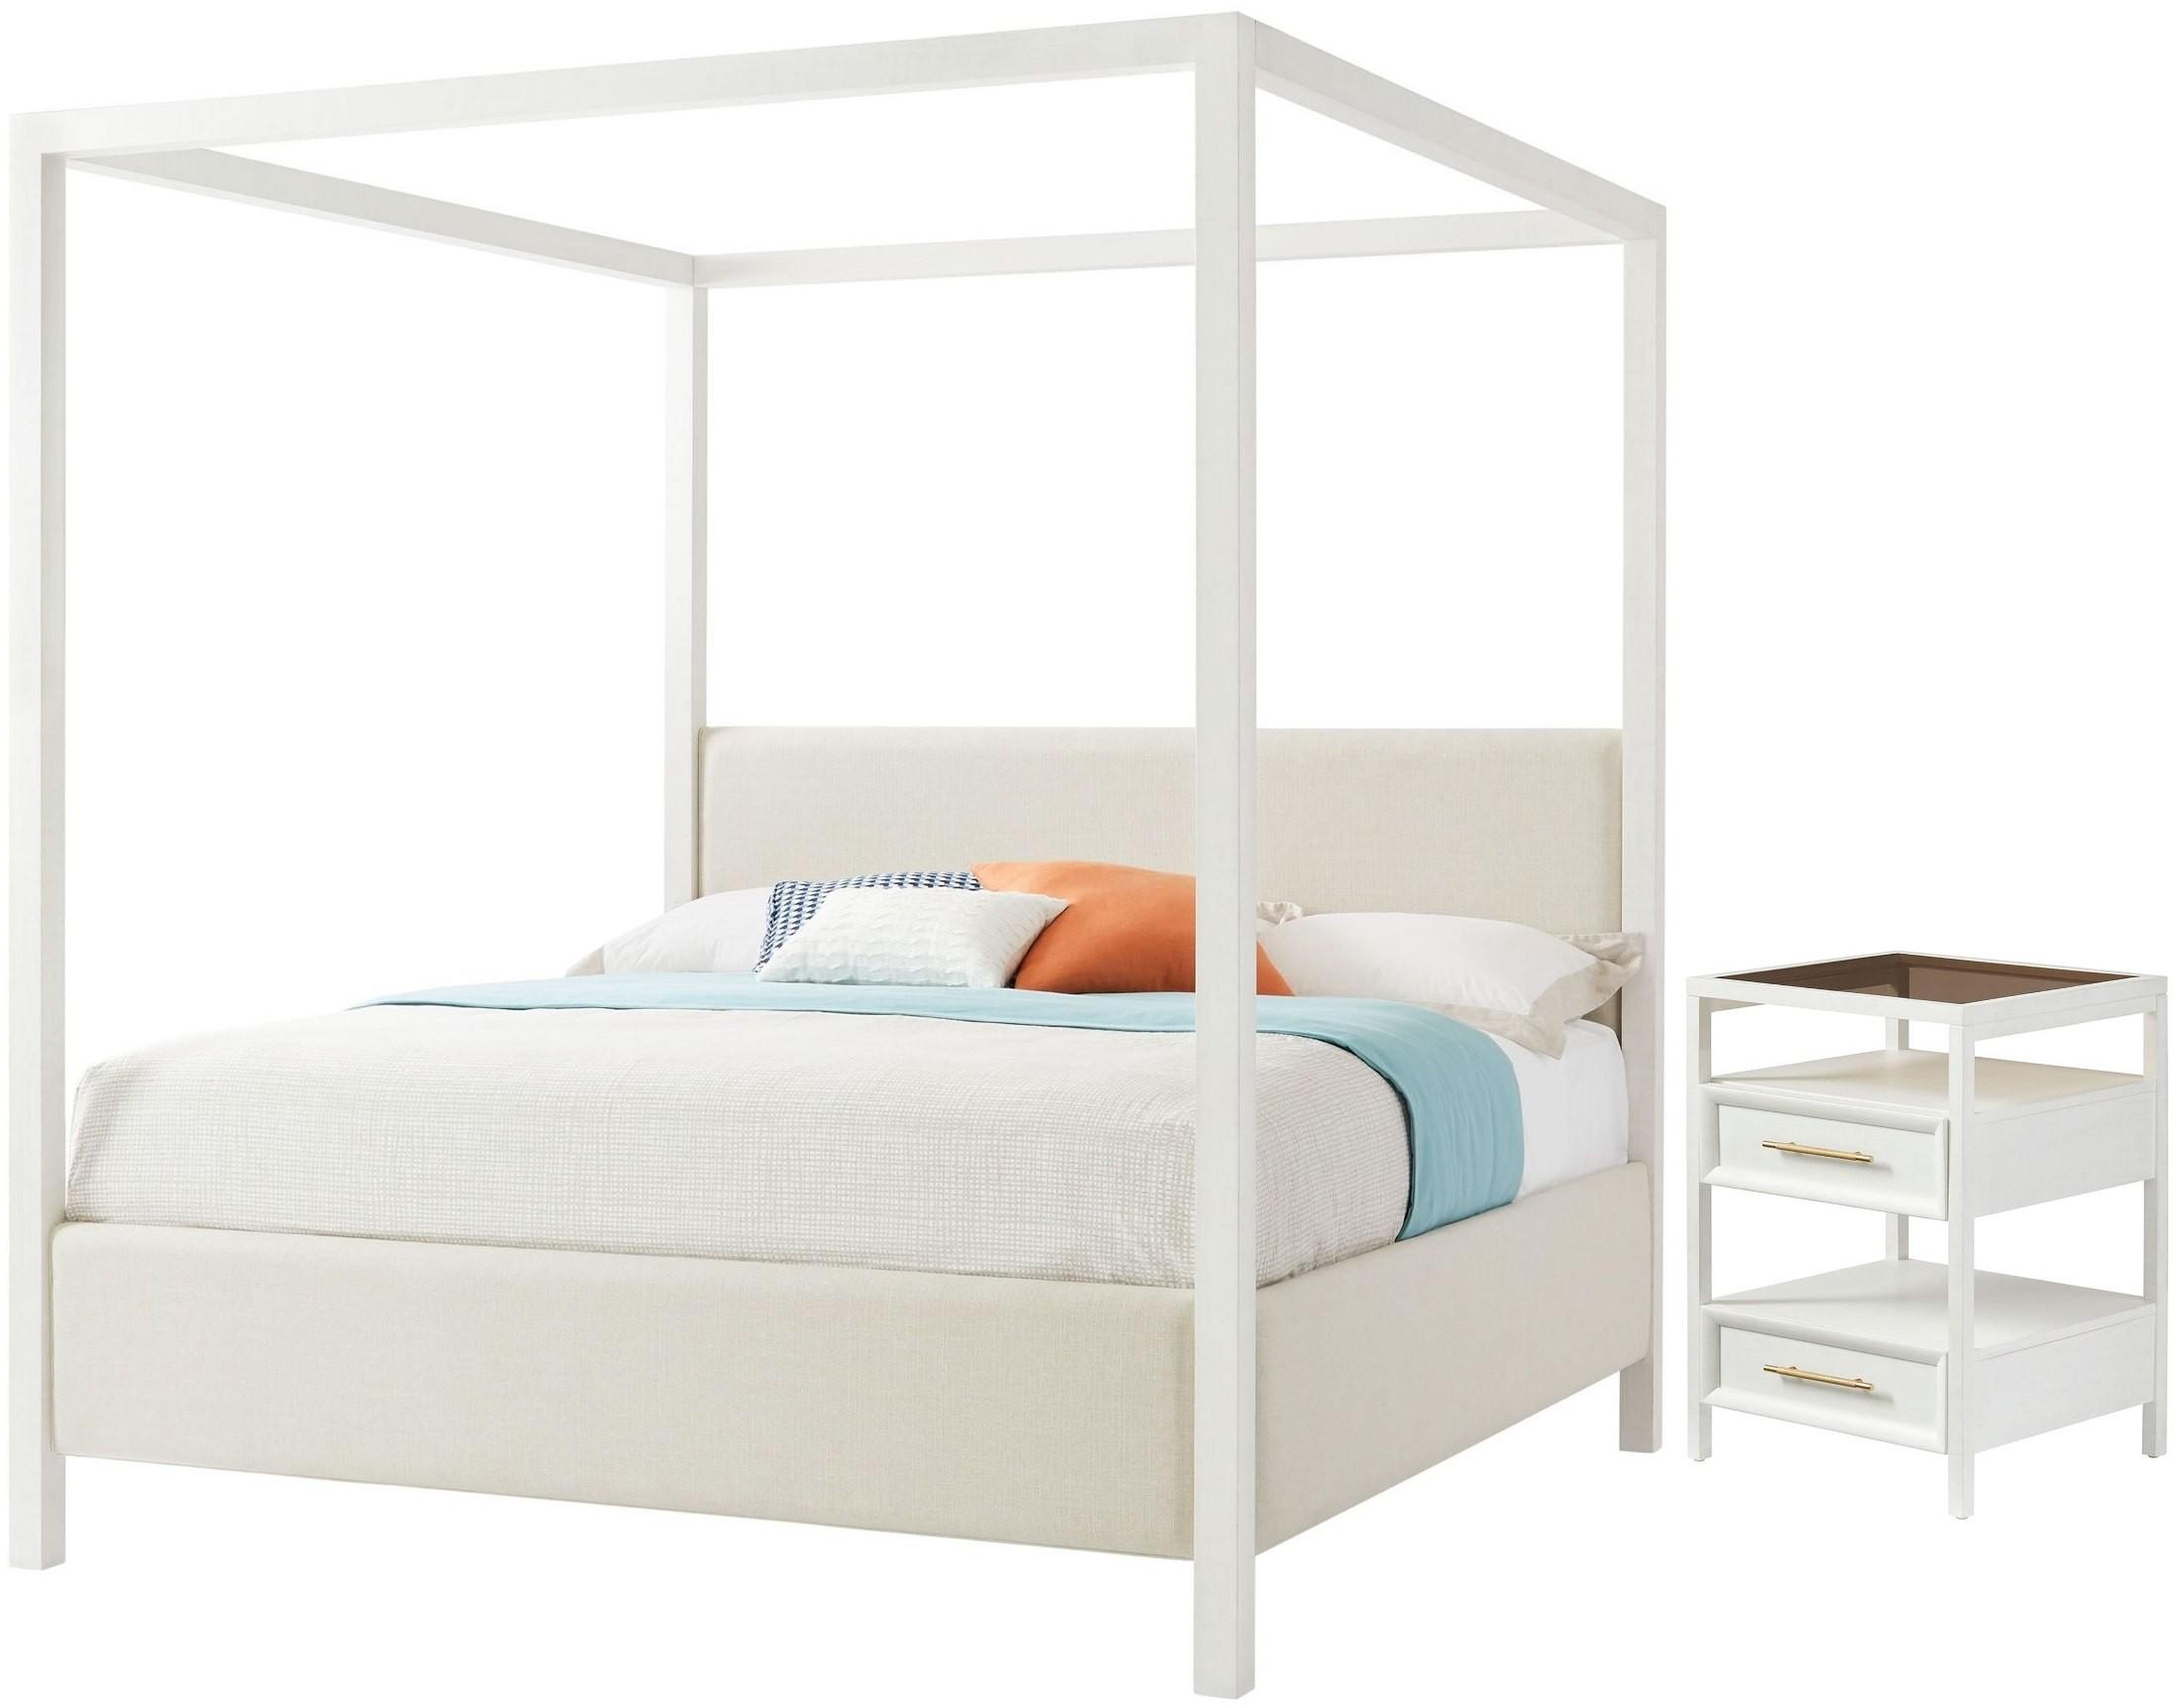 archetype furniture. Panavista Alabaster Archetype Canopy Bedroom Set From Stanley | Coleman Furniture